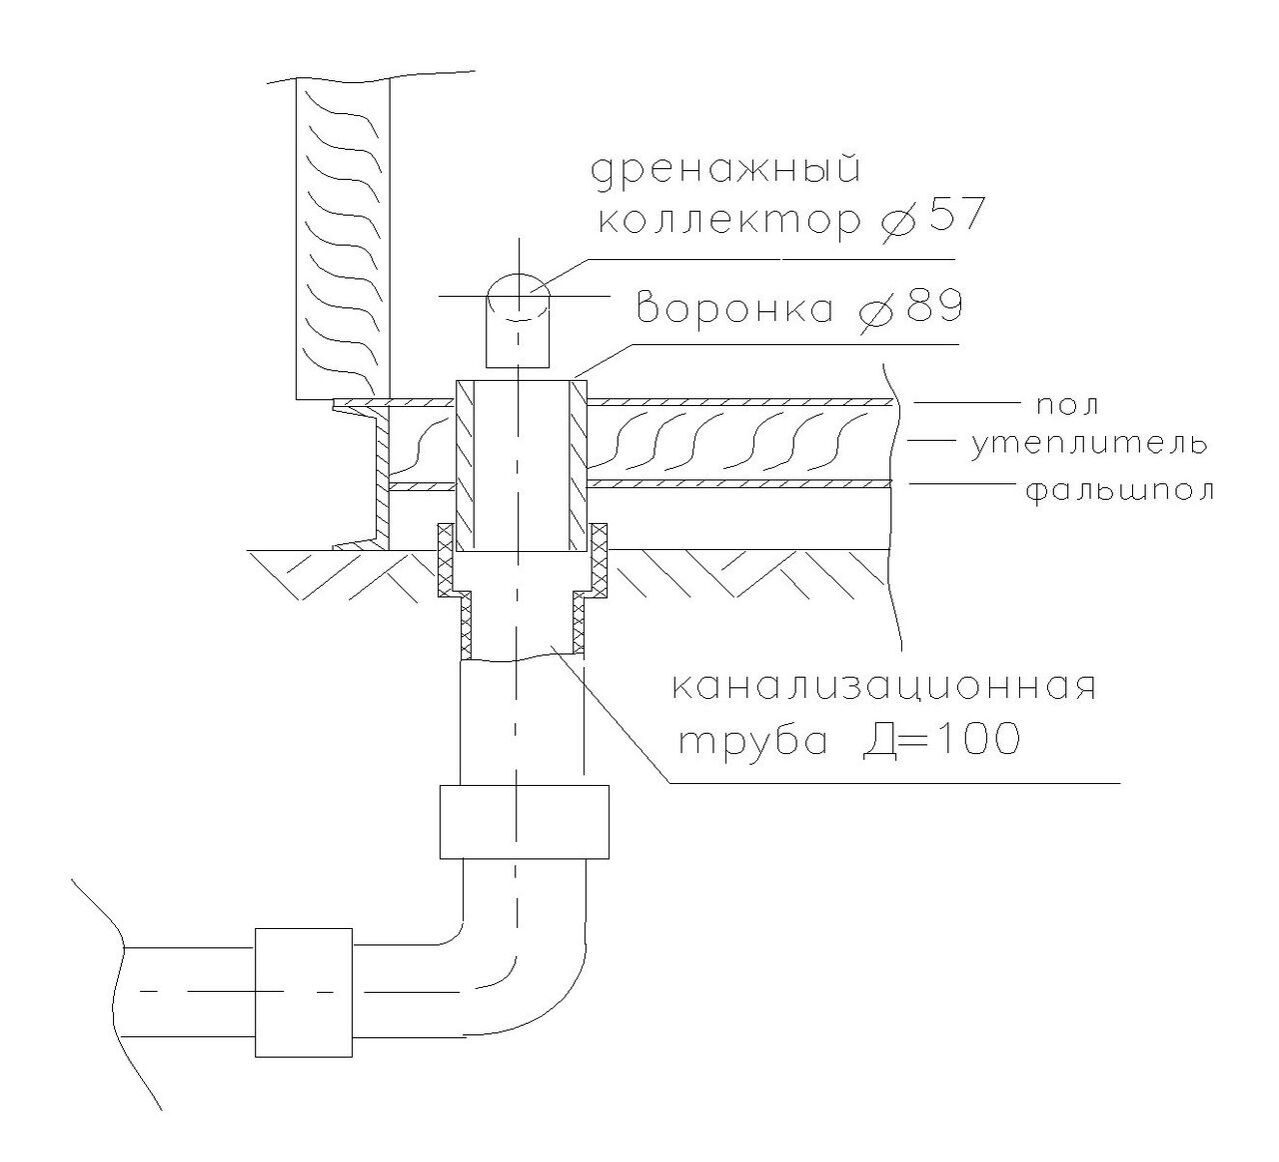 схема радиопередатчика по ескд